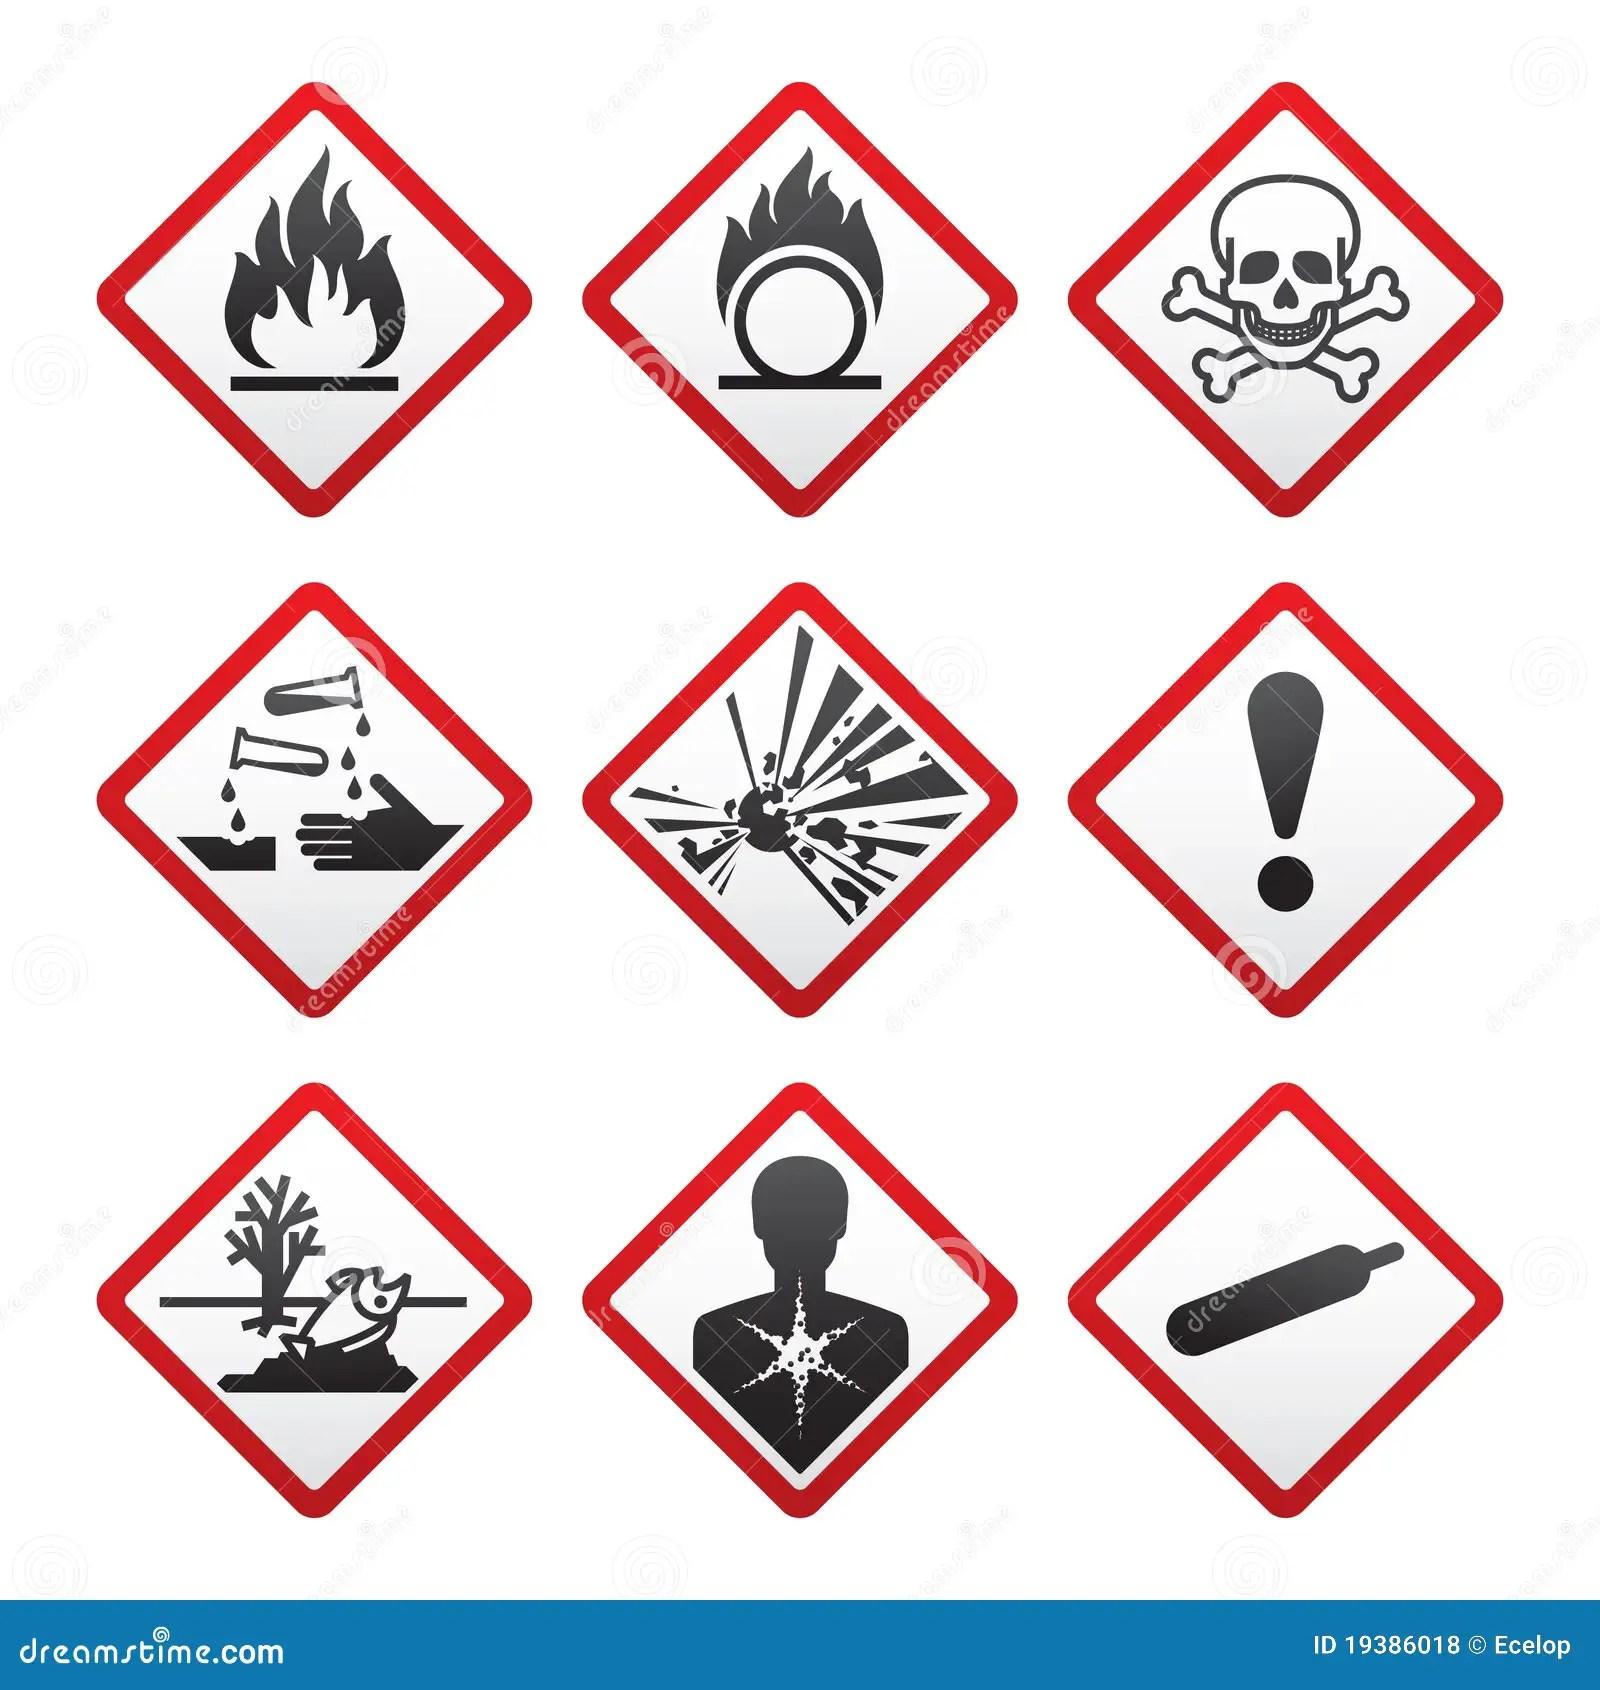 New Safety Symbols Royalty Free Stock Photos